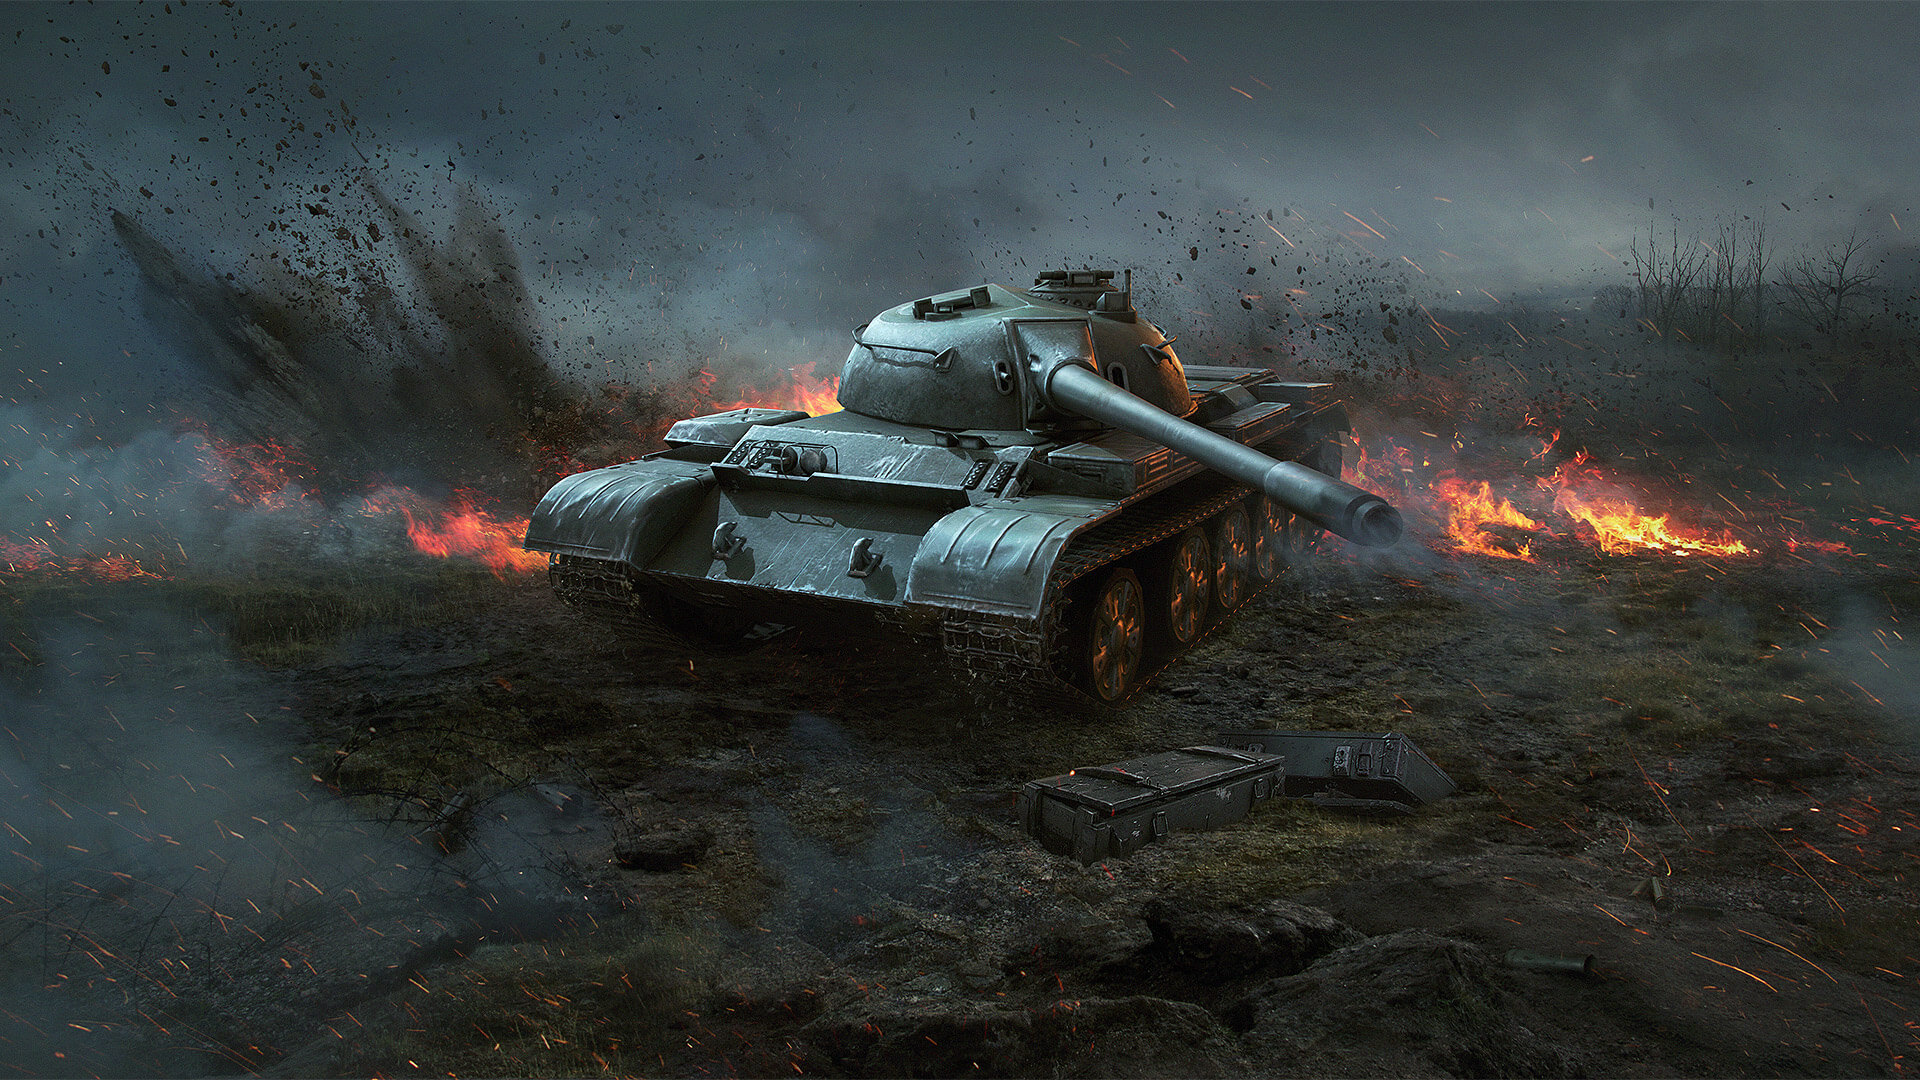 картинки фон на обложку для мира танков